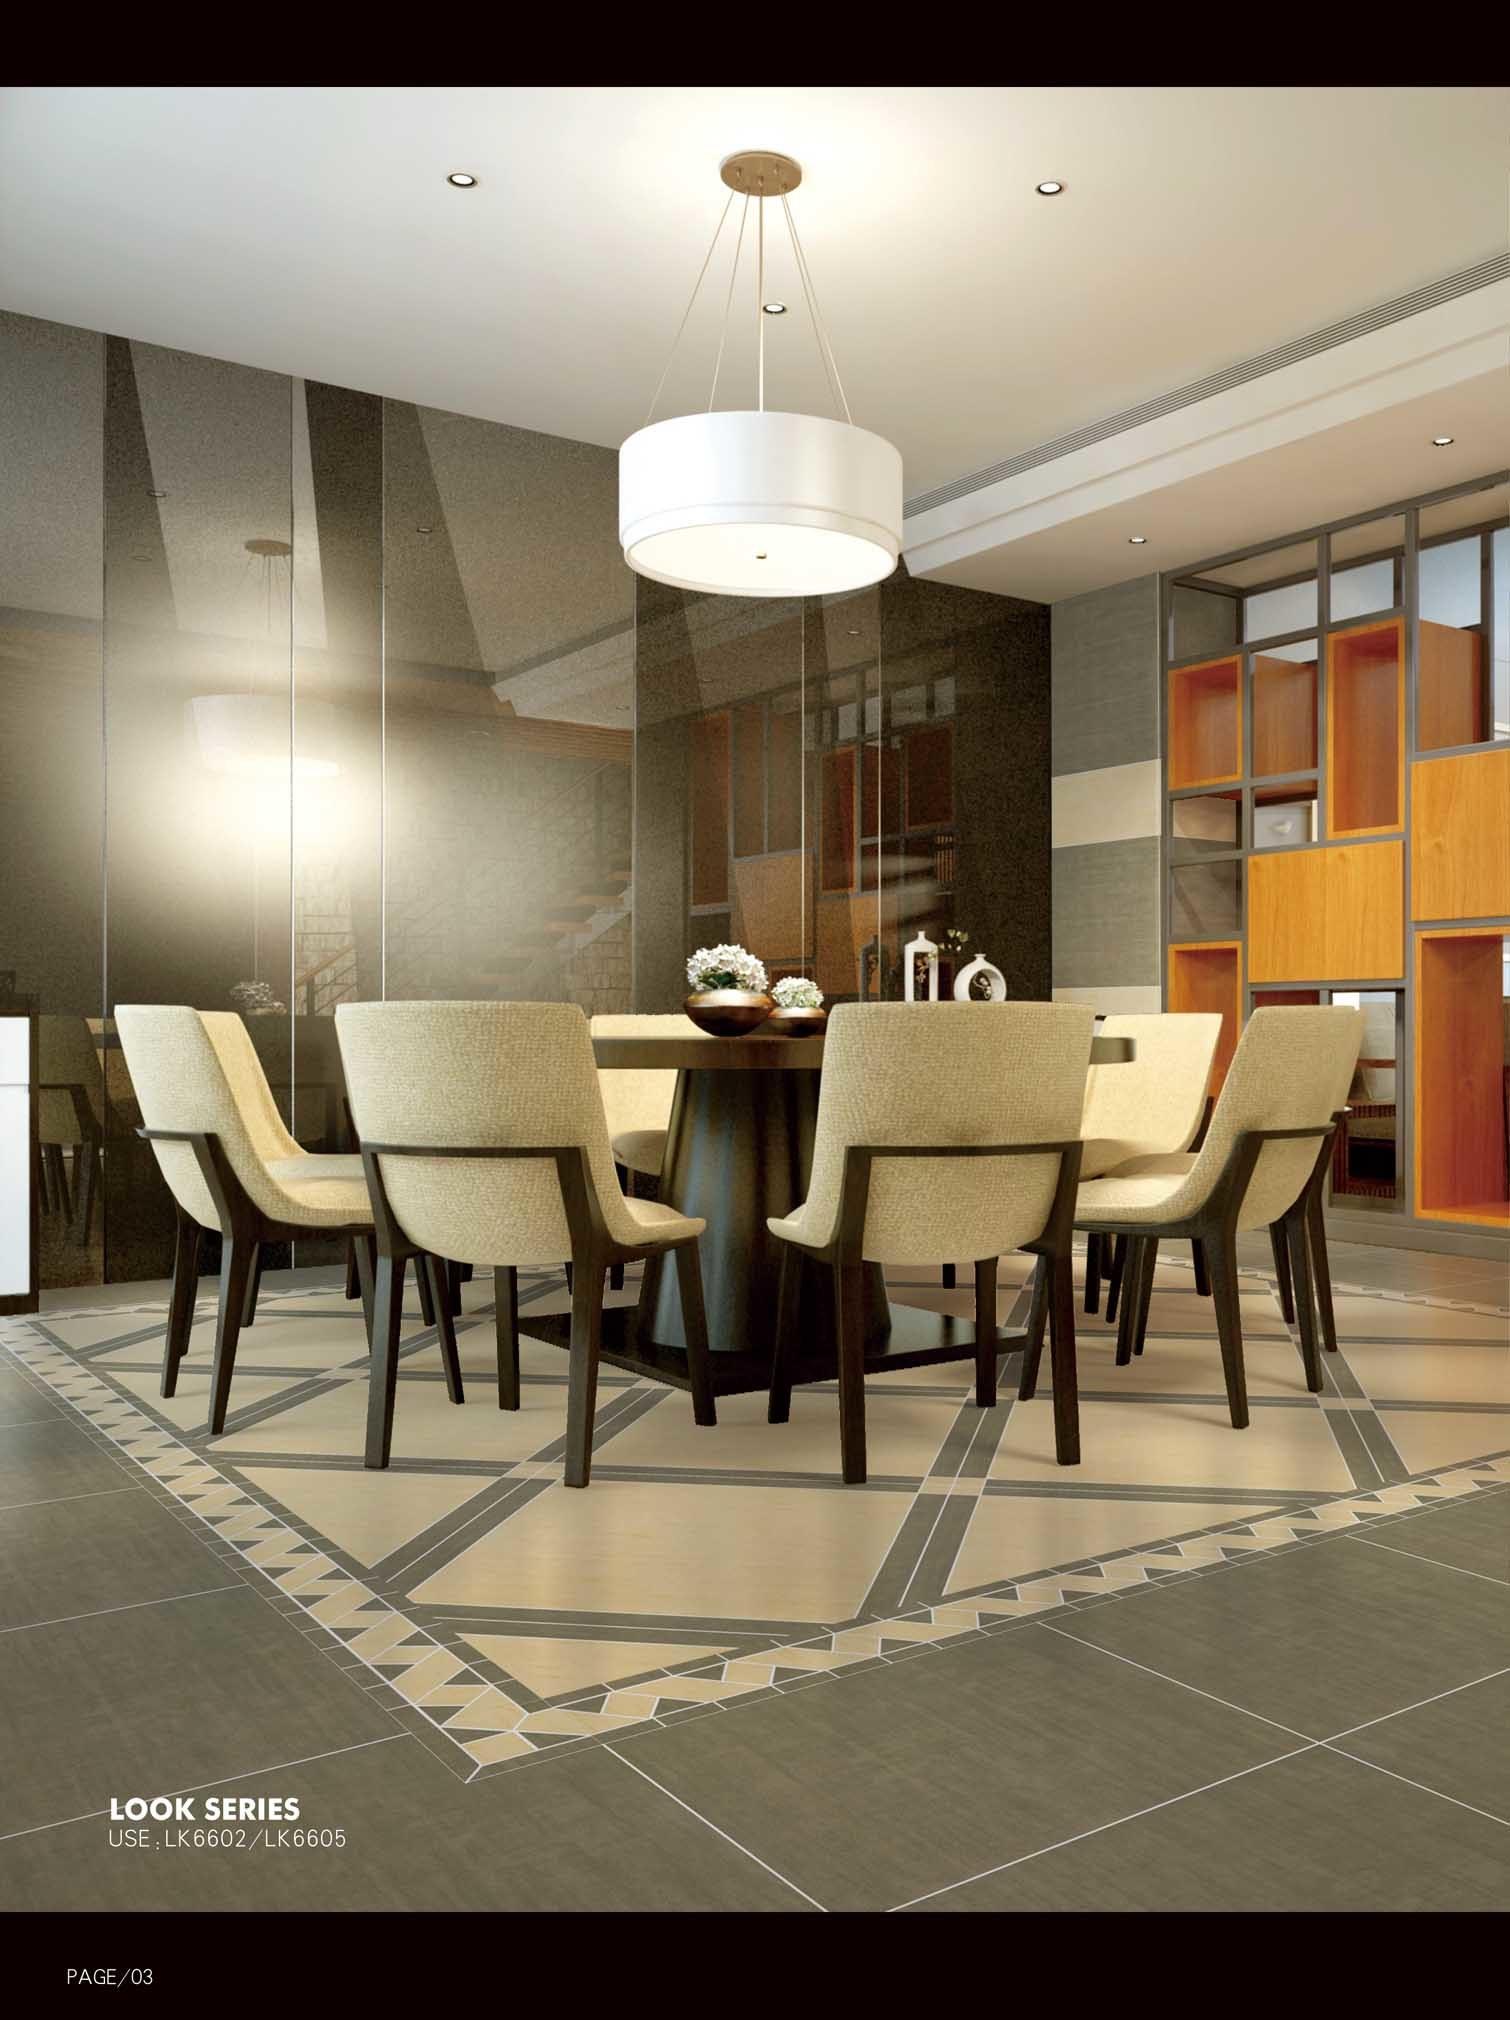 Building Material Porcelain Tiles Floor Tile 600*600mm Anti-Slip Rustic Bone Color Tile